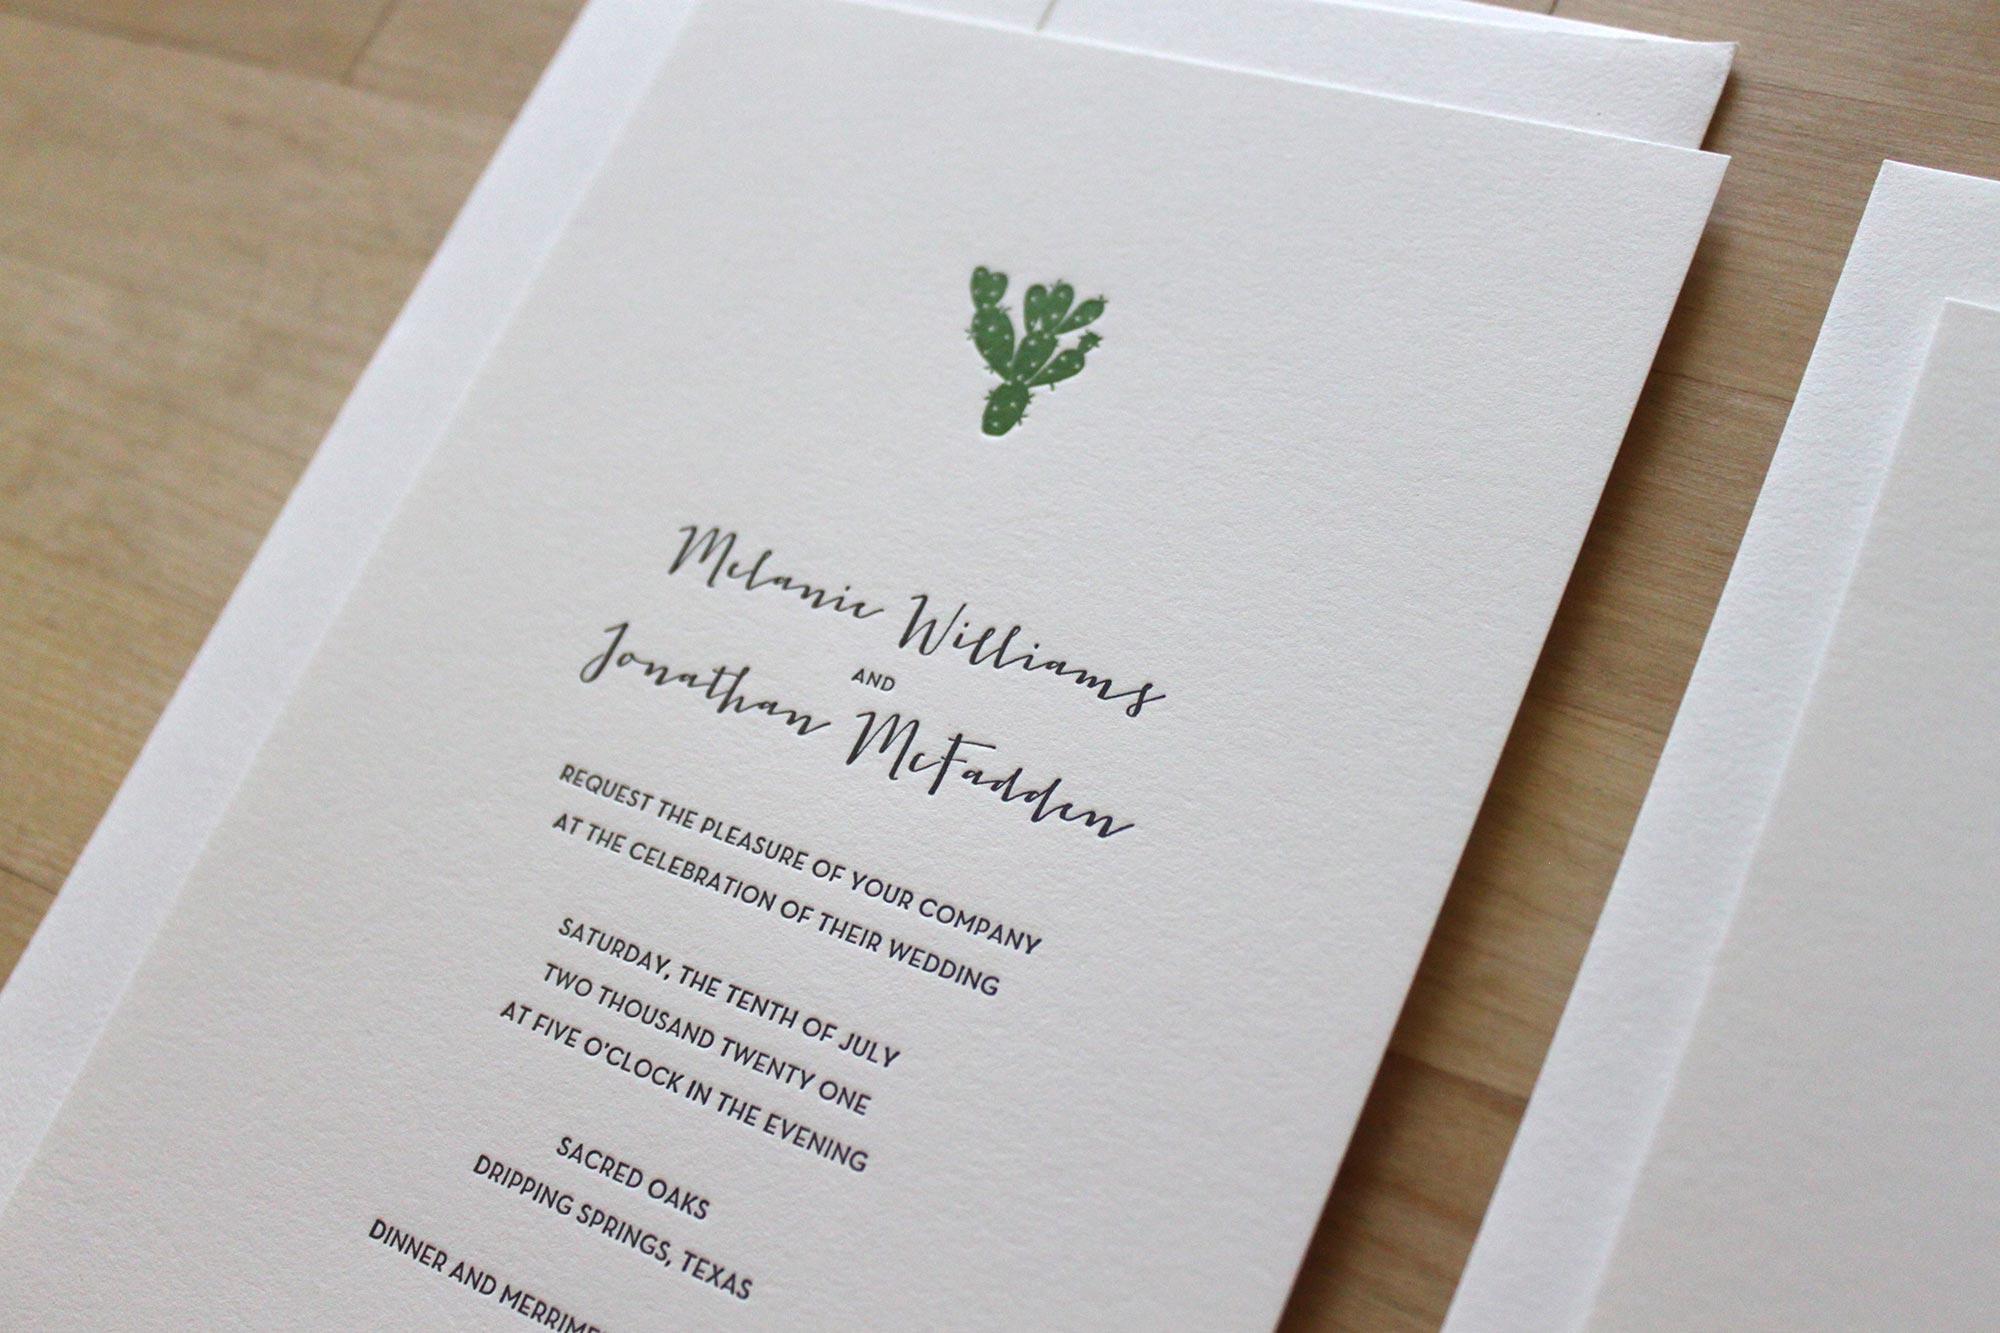 Cactus-4-letterpress-wedding-invitations.jpg